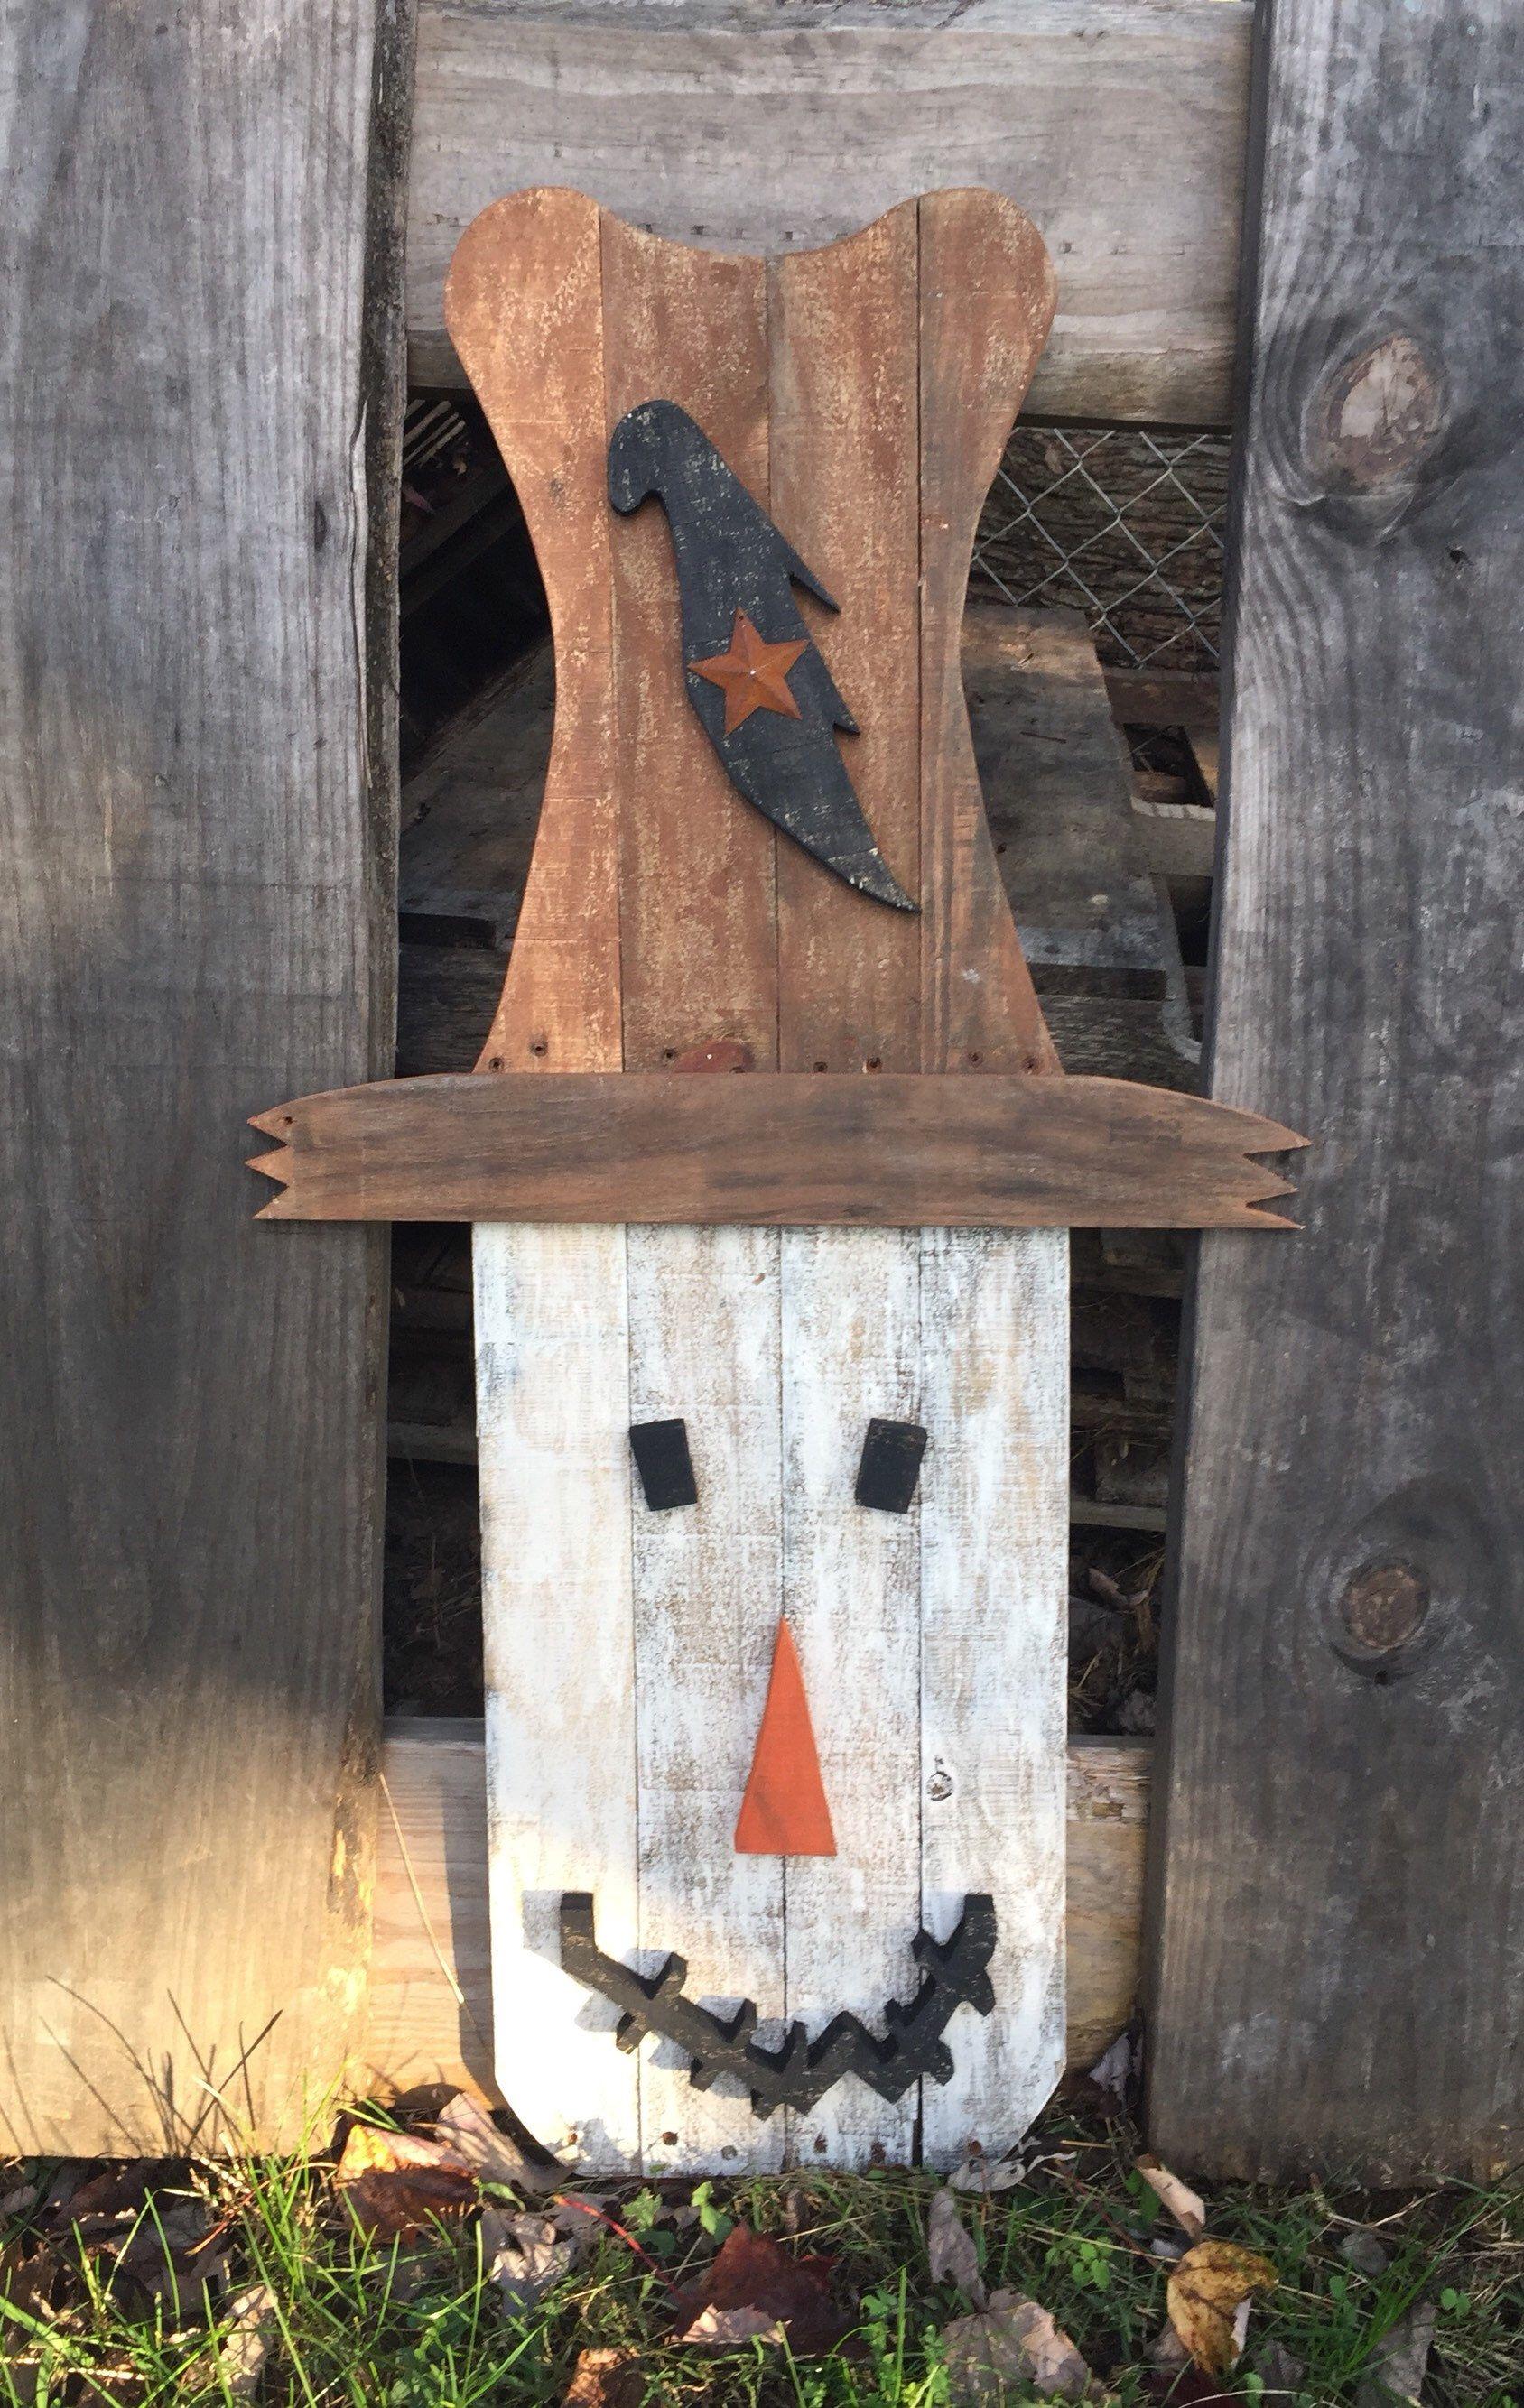 Wooden Scarecrow Scarecrow Rustic Scarecrow Rustic Wooden